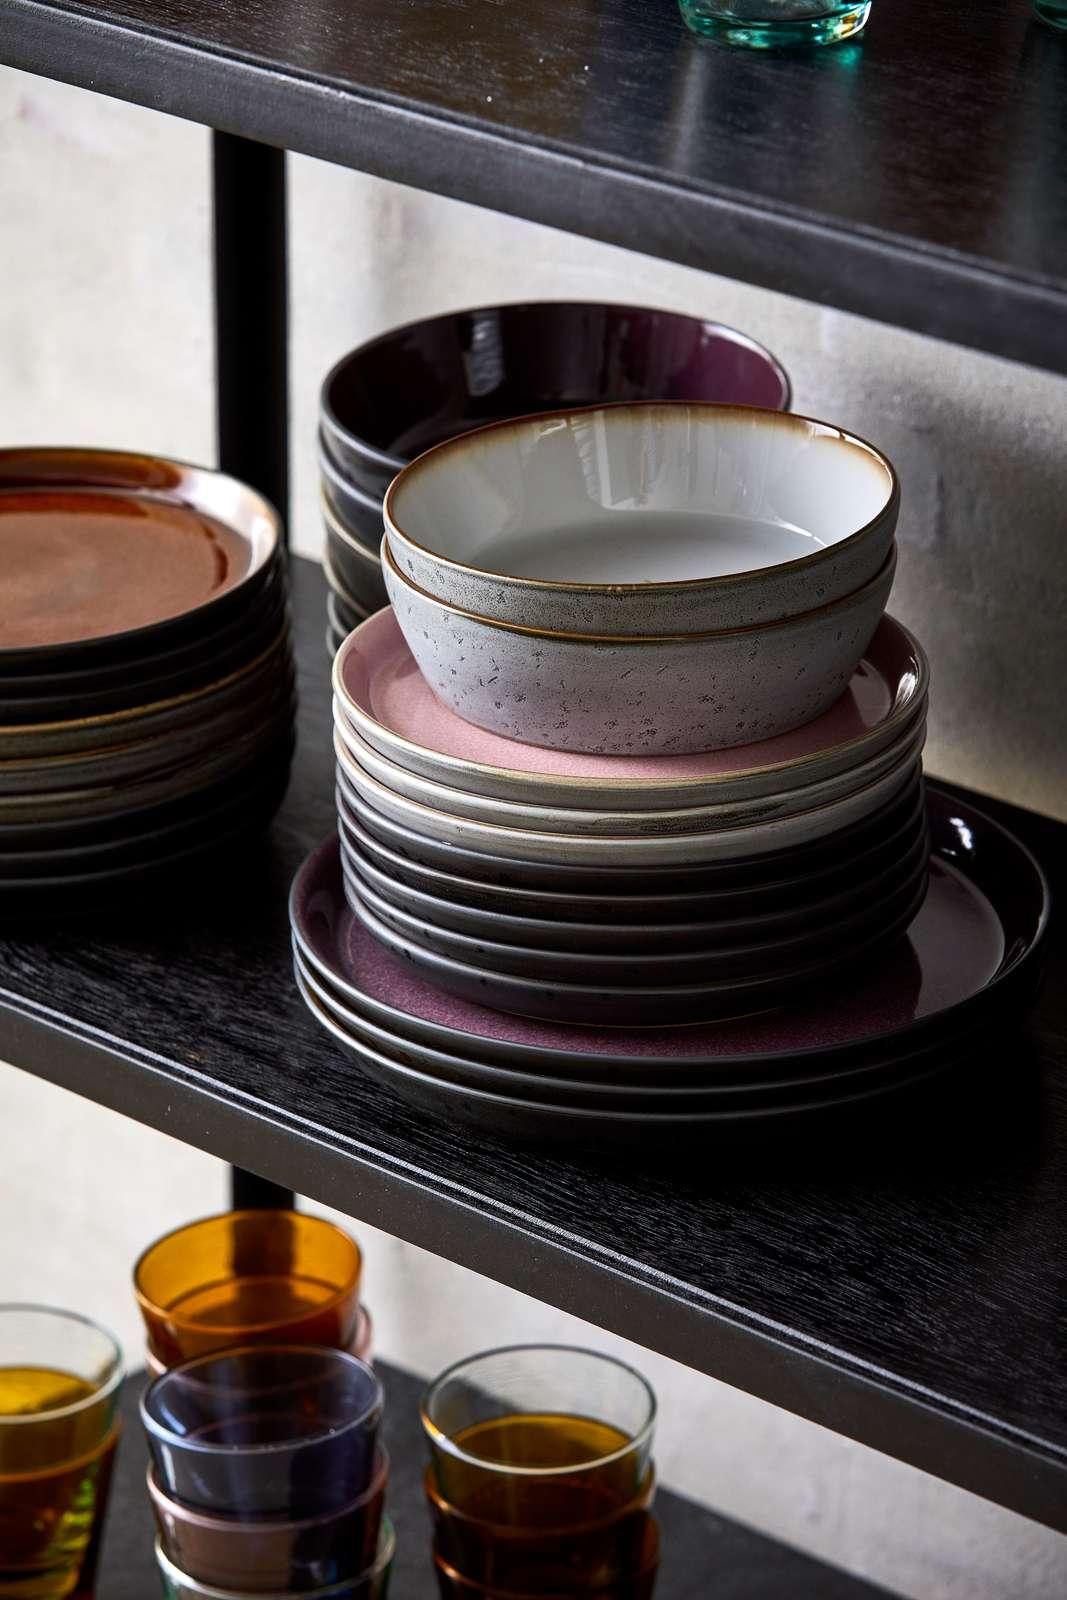 Kaufe Bitz Gastro Plate 21 Cm Grey Light Pink 821407 Grey Light Pink Inkl Versand